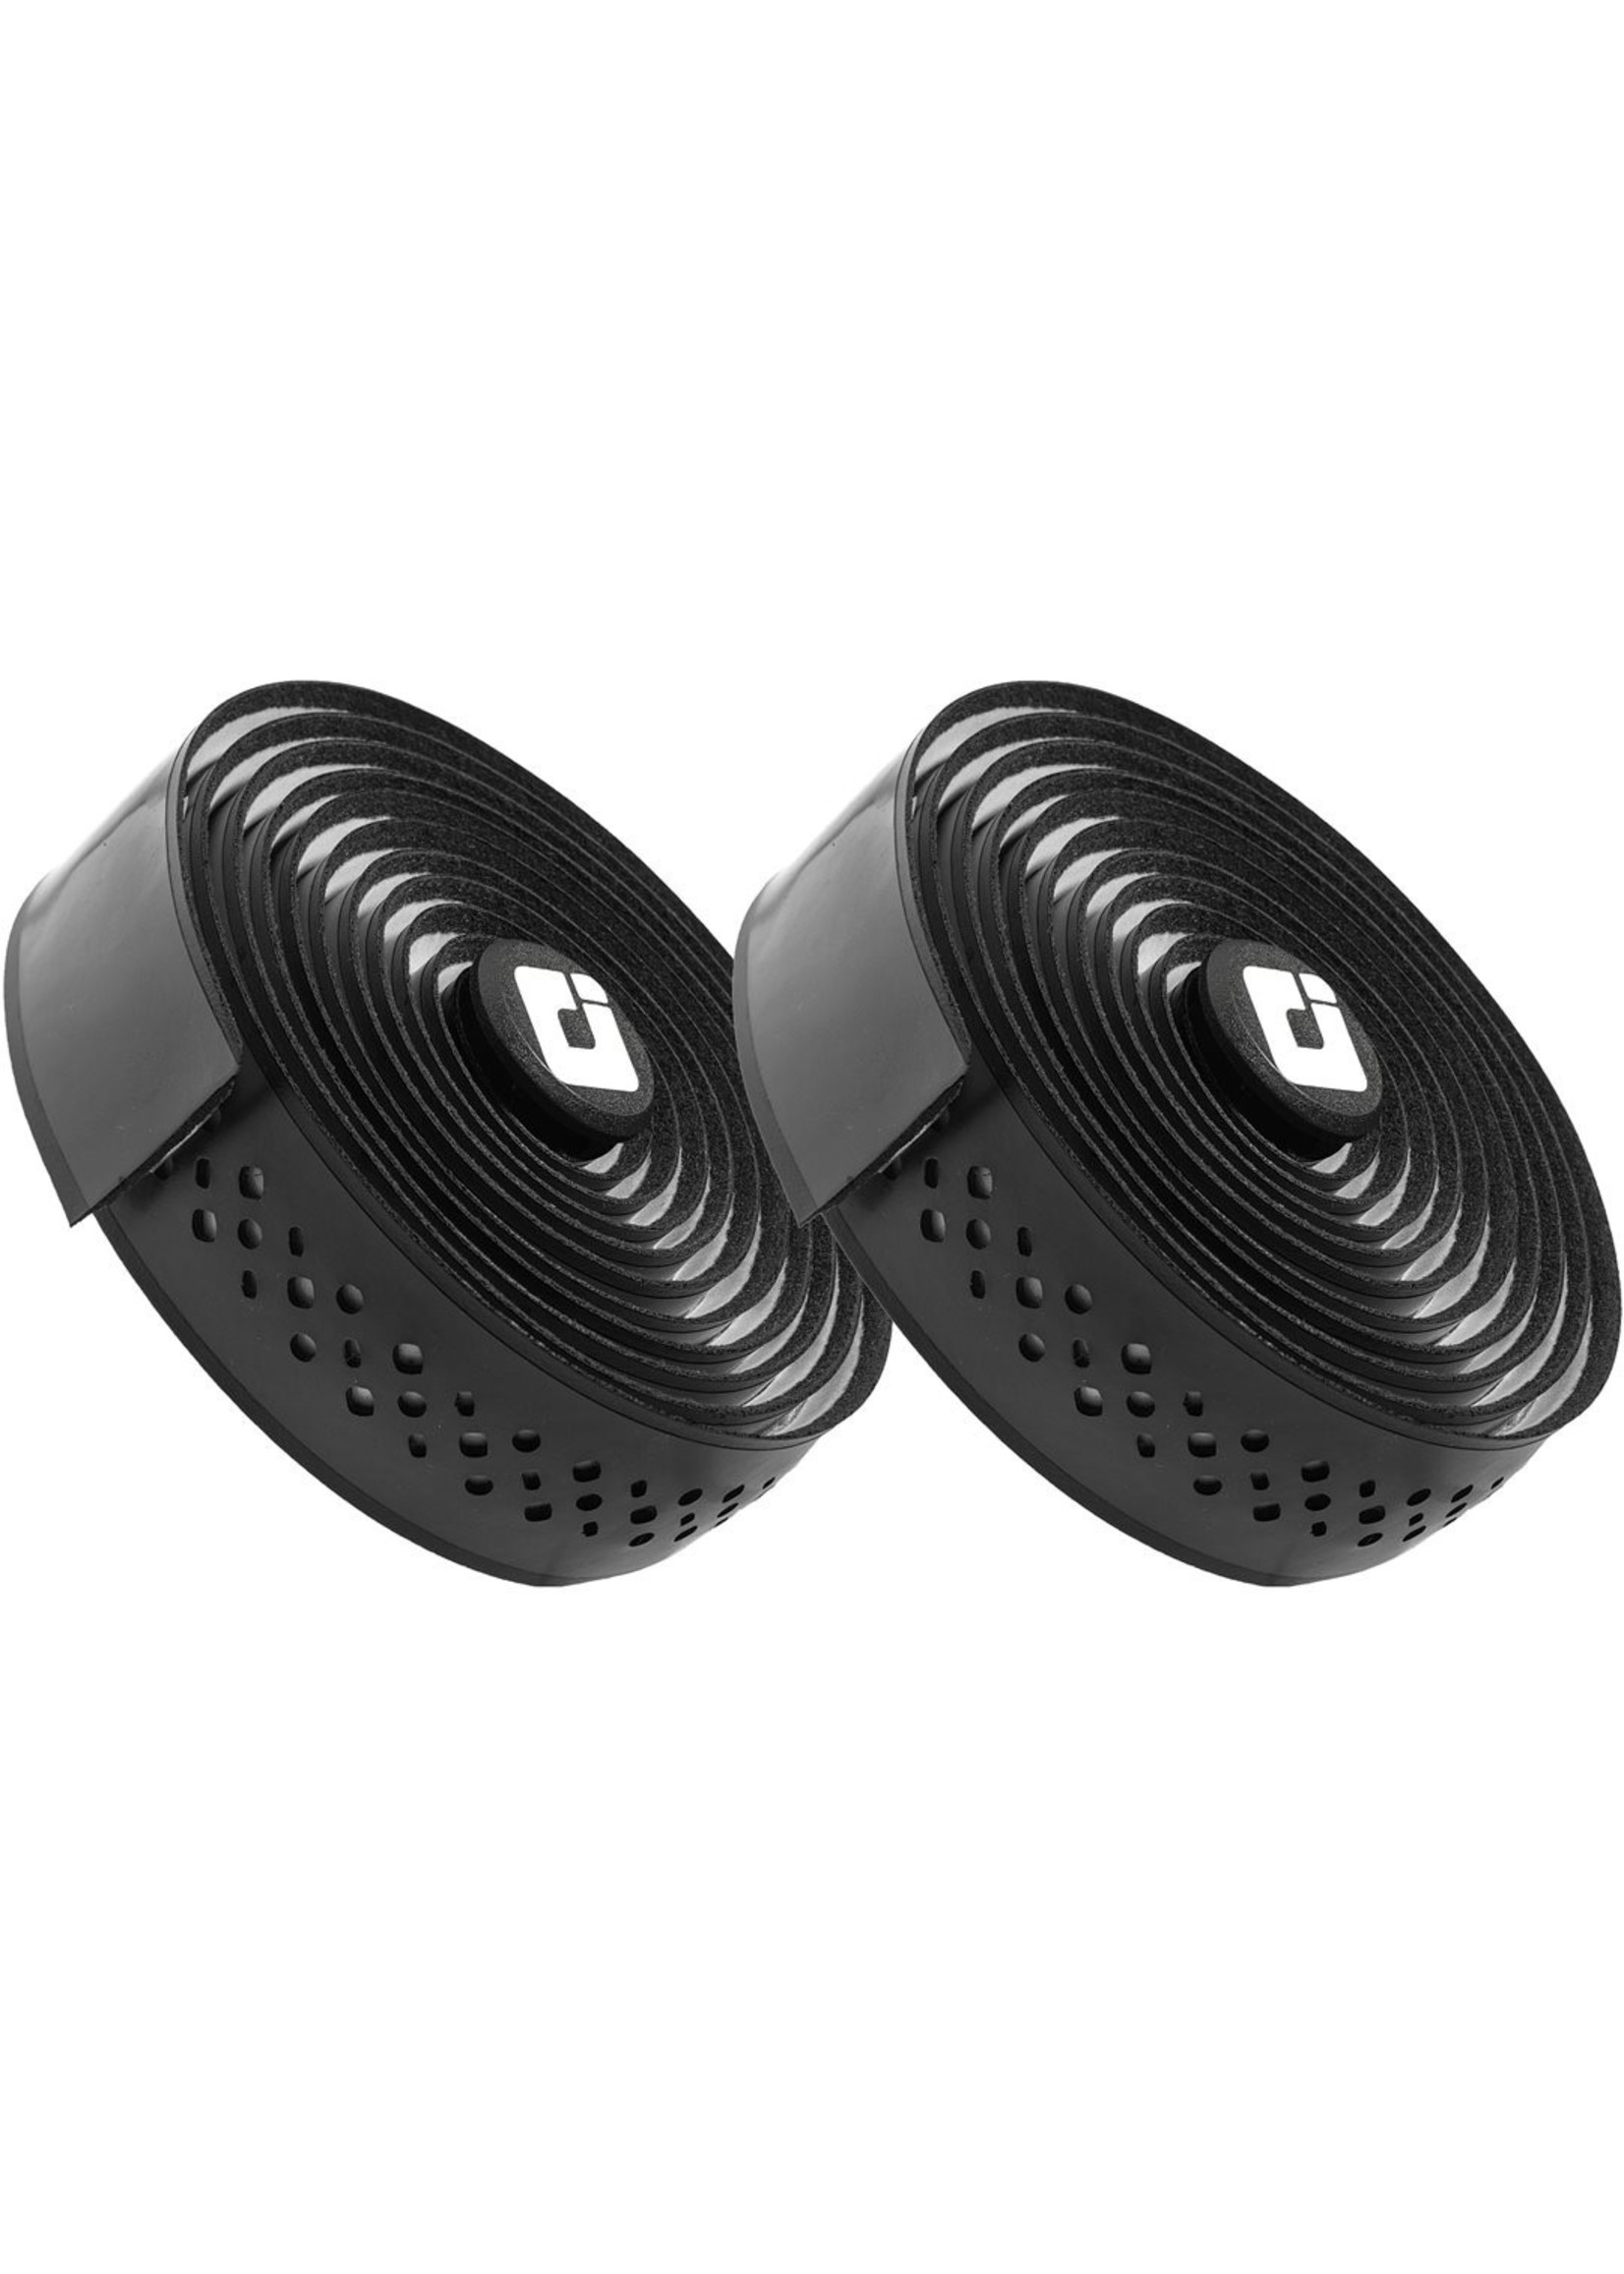 ODI Performance Bar Tape 3.5mm - Black